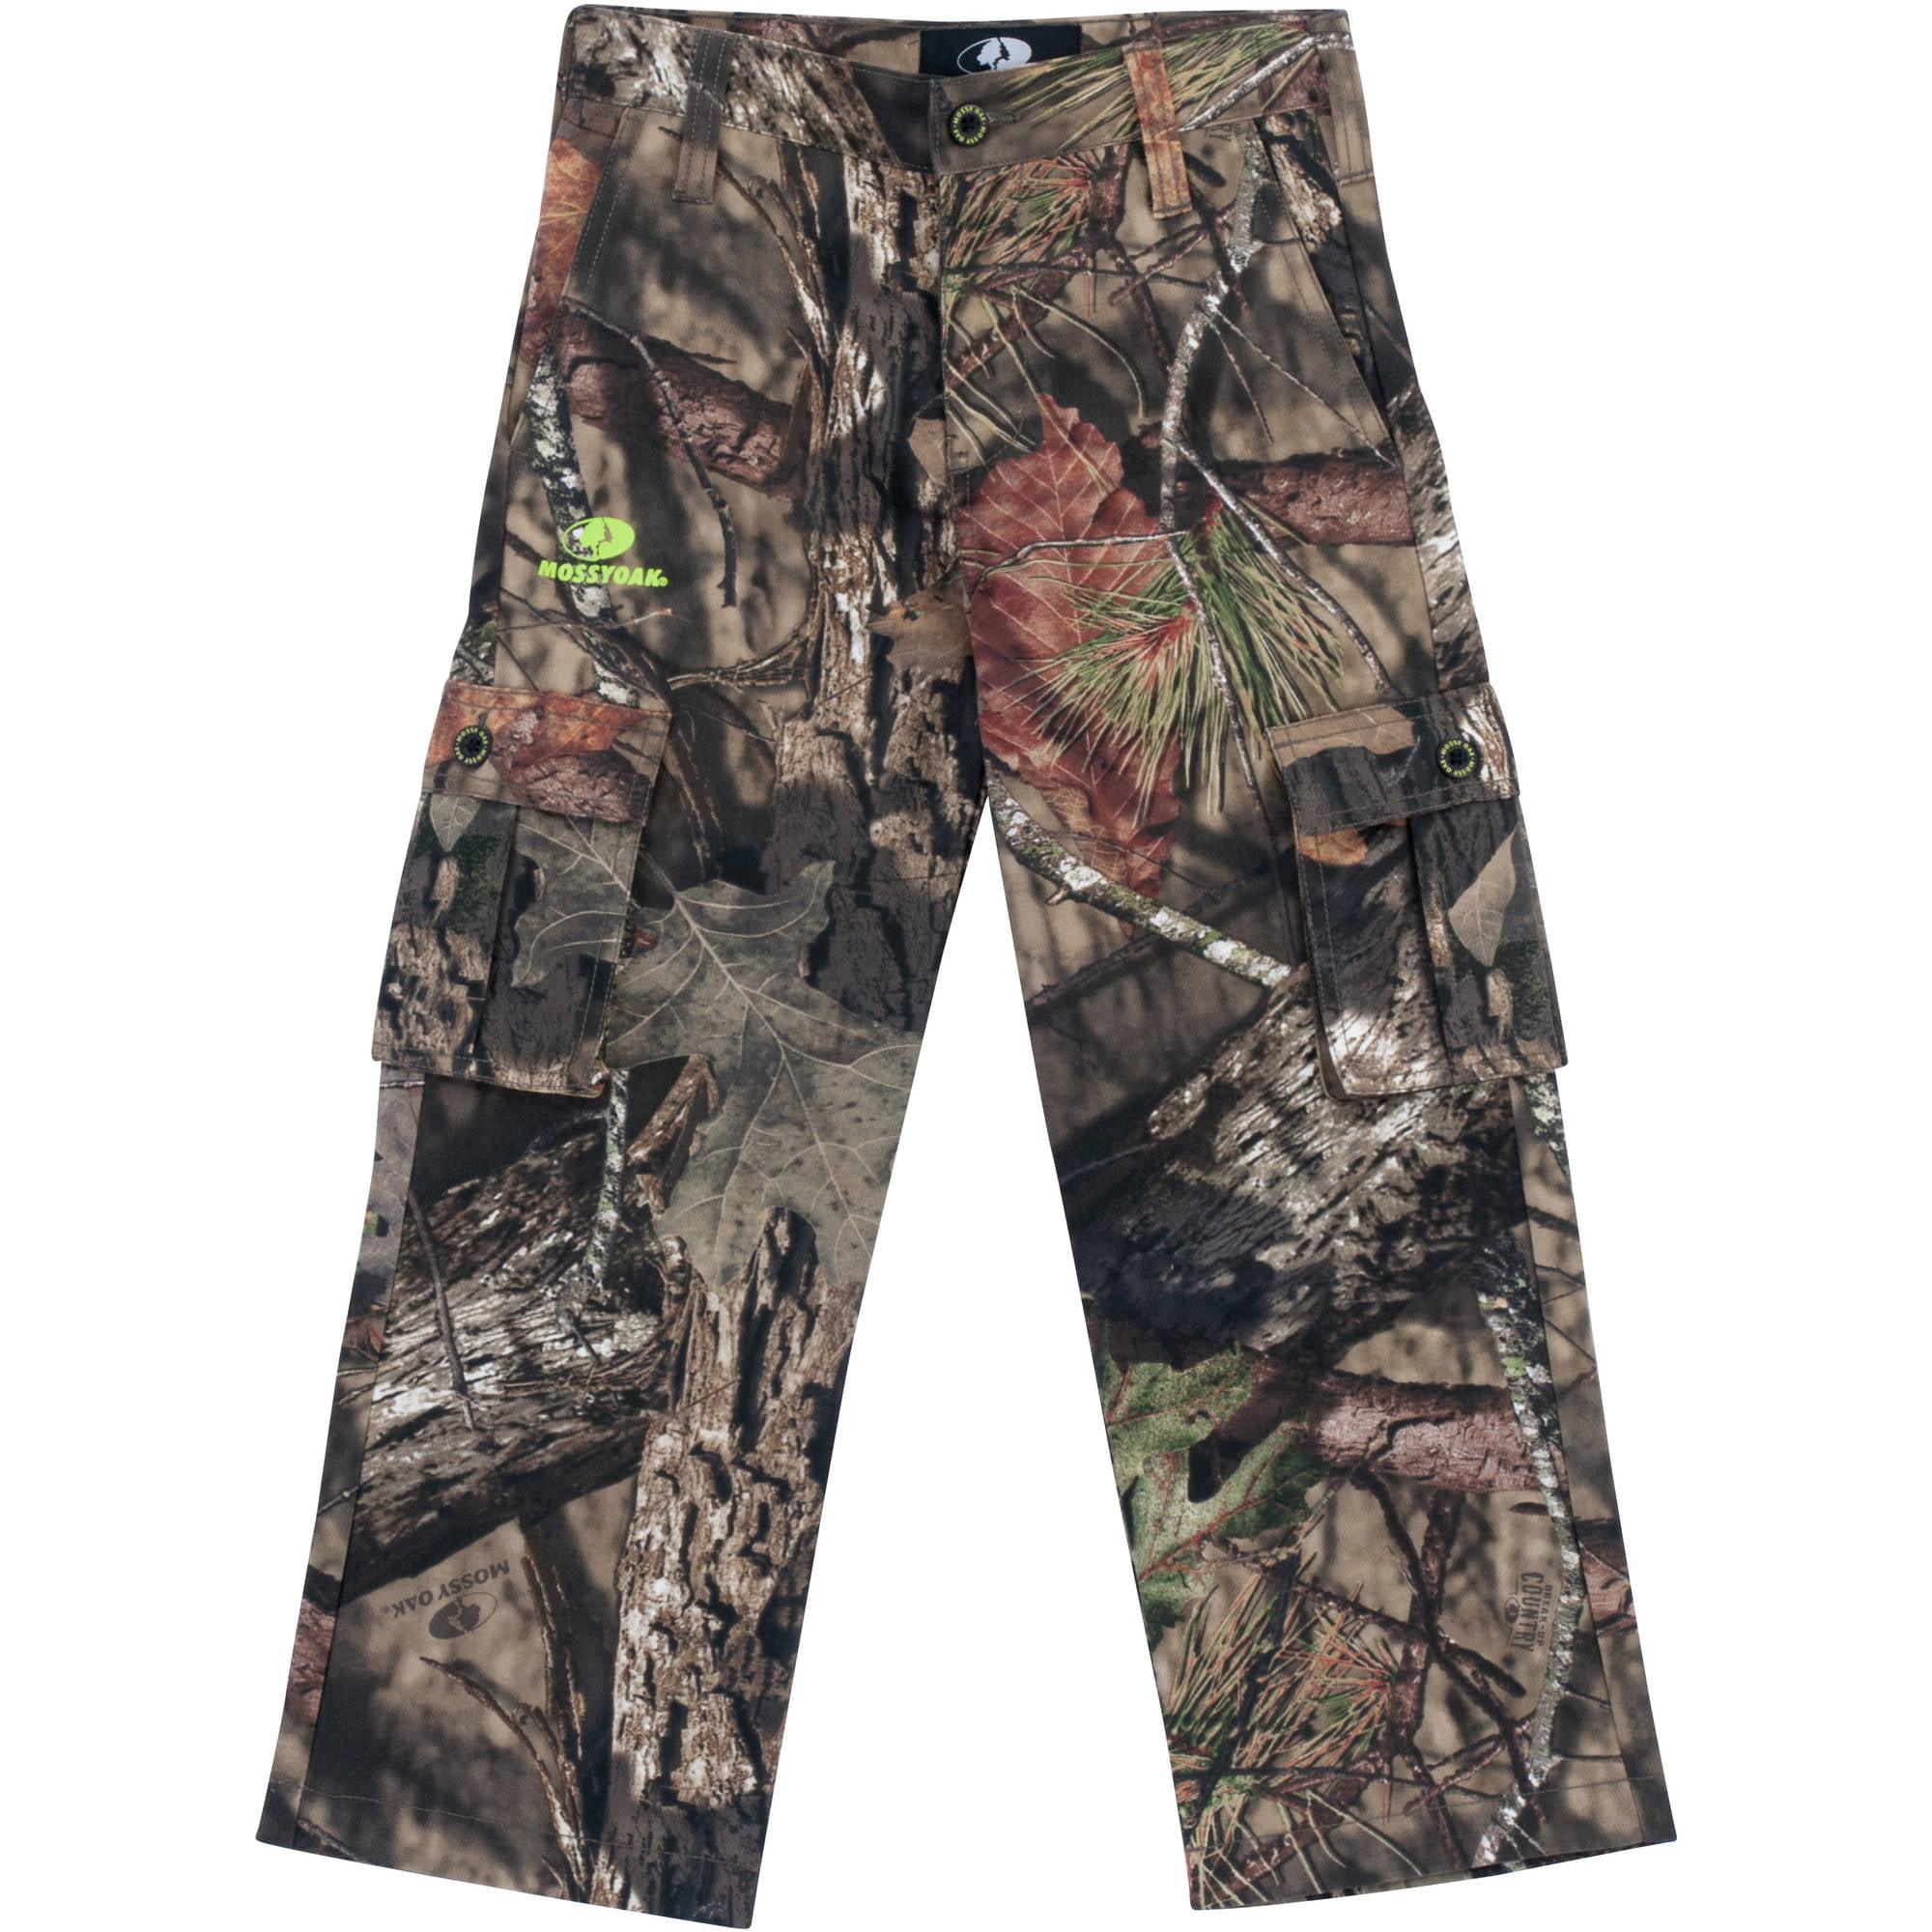 c3a6f5f7e Mossy Oak Youth Cargo Pant - Breakup Country - Walmart.com